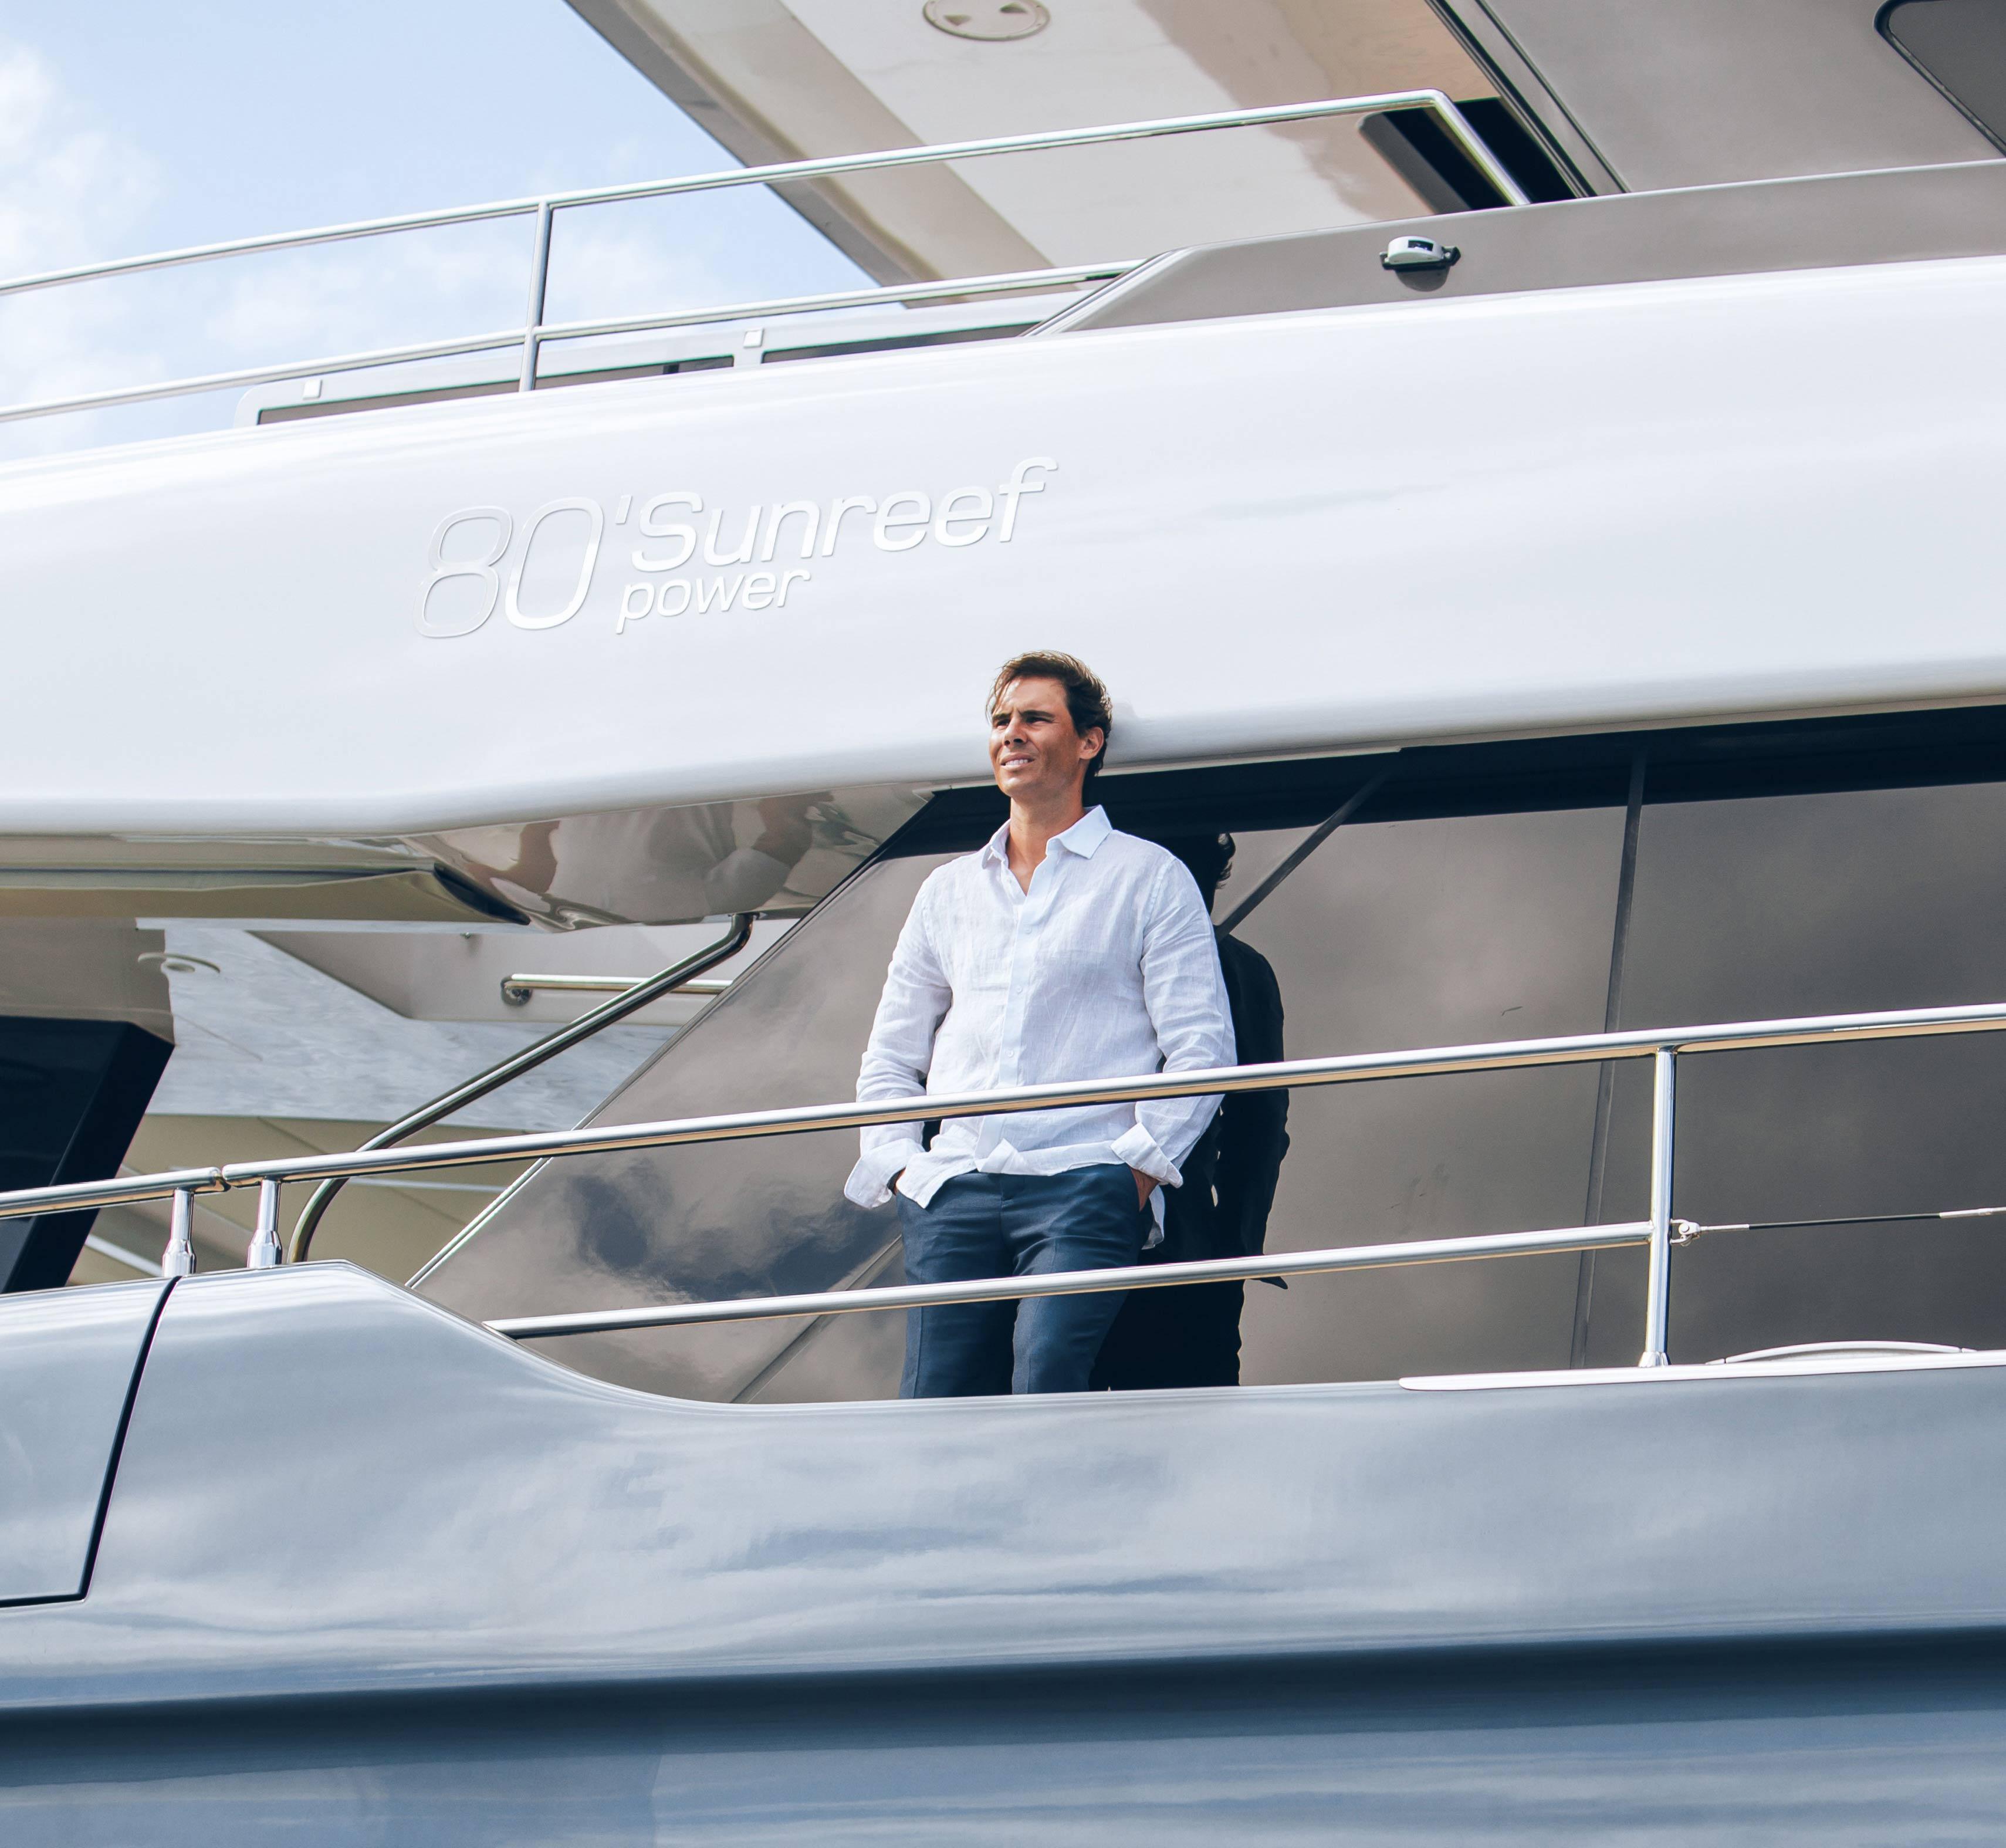 80 Sunreef Power With Rafael Nadal On Board Great White